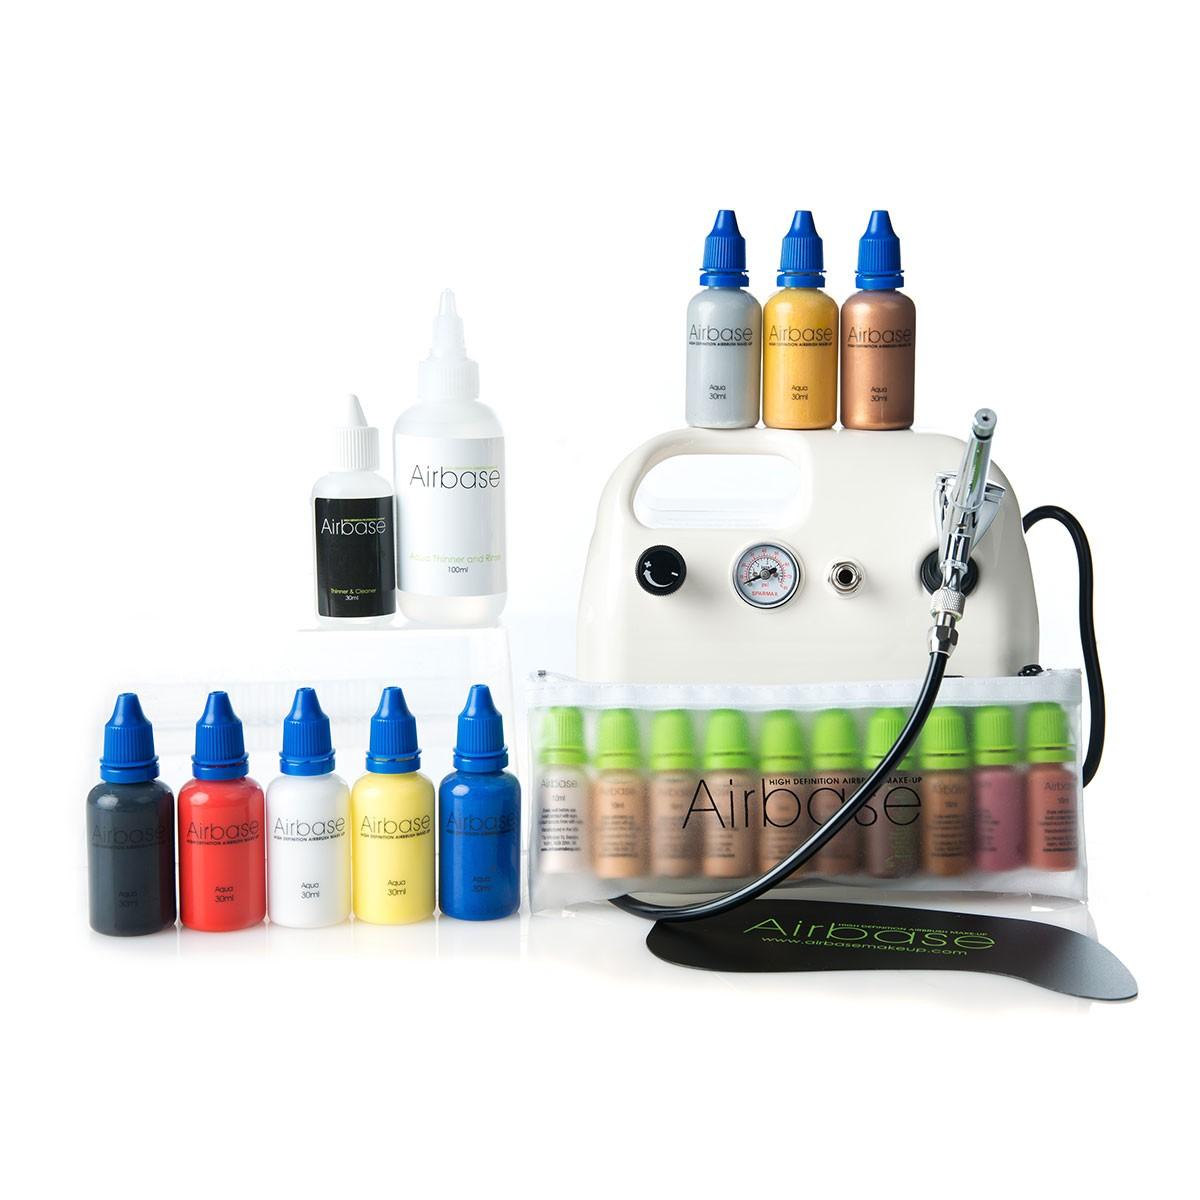 Airbrush Multi-Purpose Kit - 8 Primary Colours